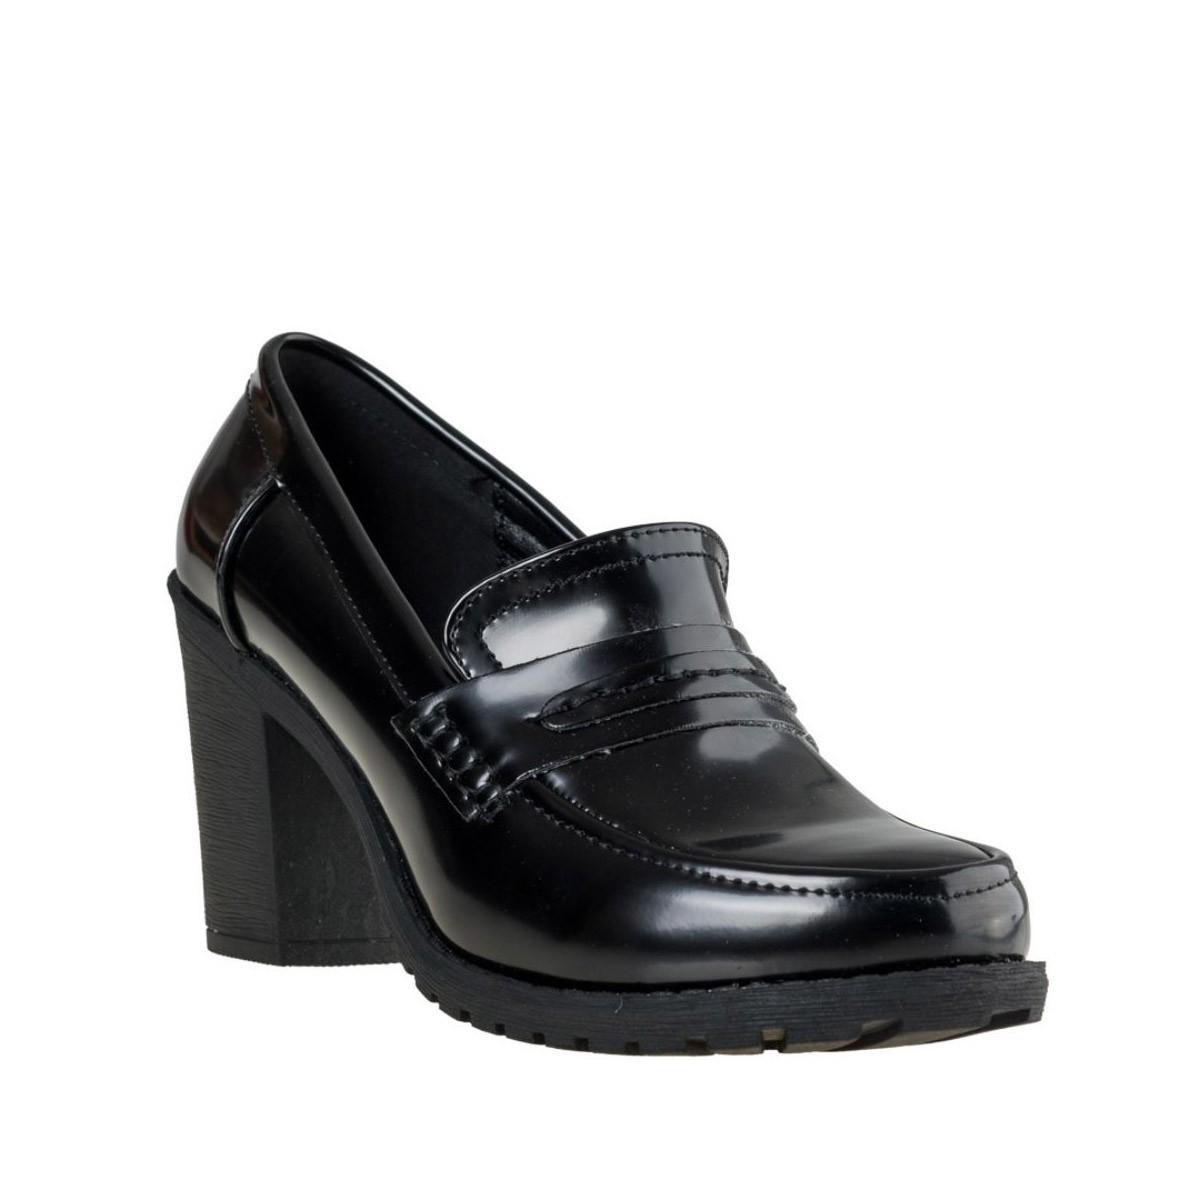 Fashion Icon Γυναικεία Παπούτσια Oxford F64-8031 Μαύρο Fashion icon F64-8031 M